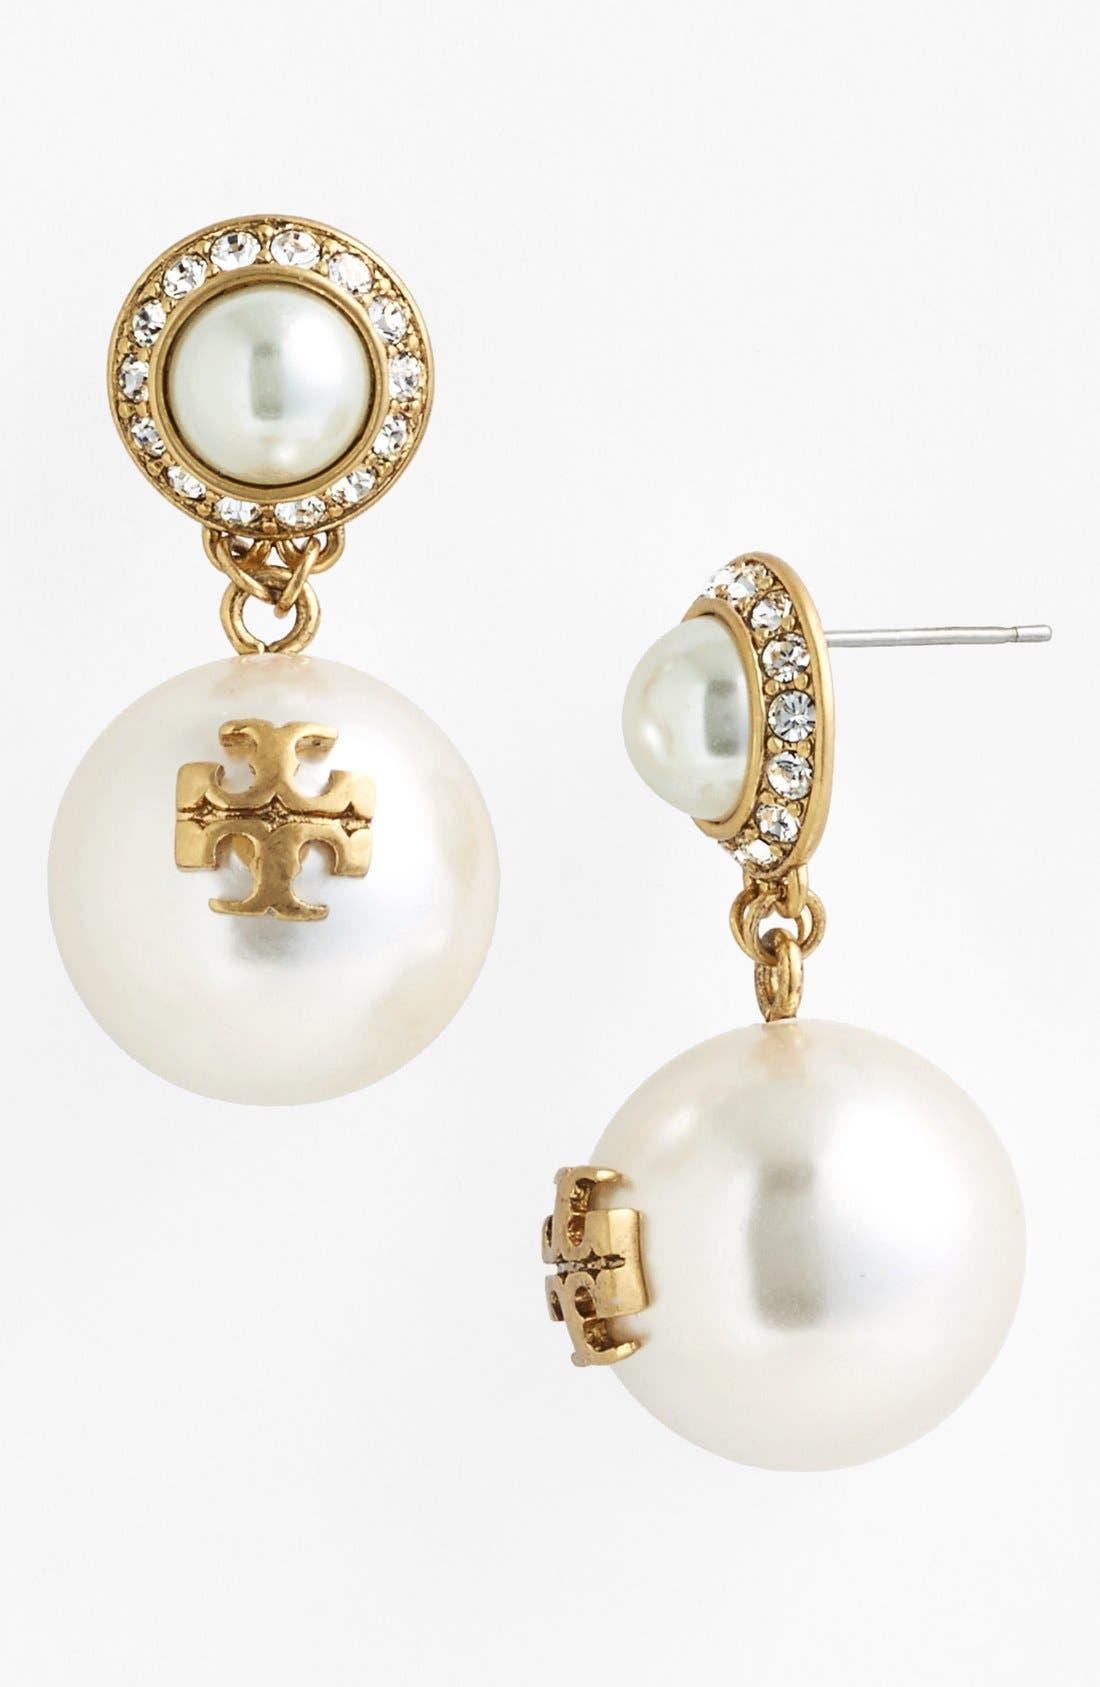 Alternate Image 1 Selected - Tory Burch 'Selma' Faux Pearl Drop Earrings